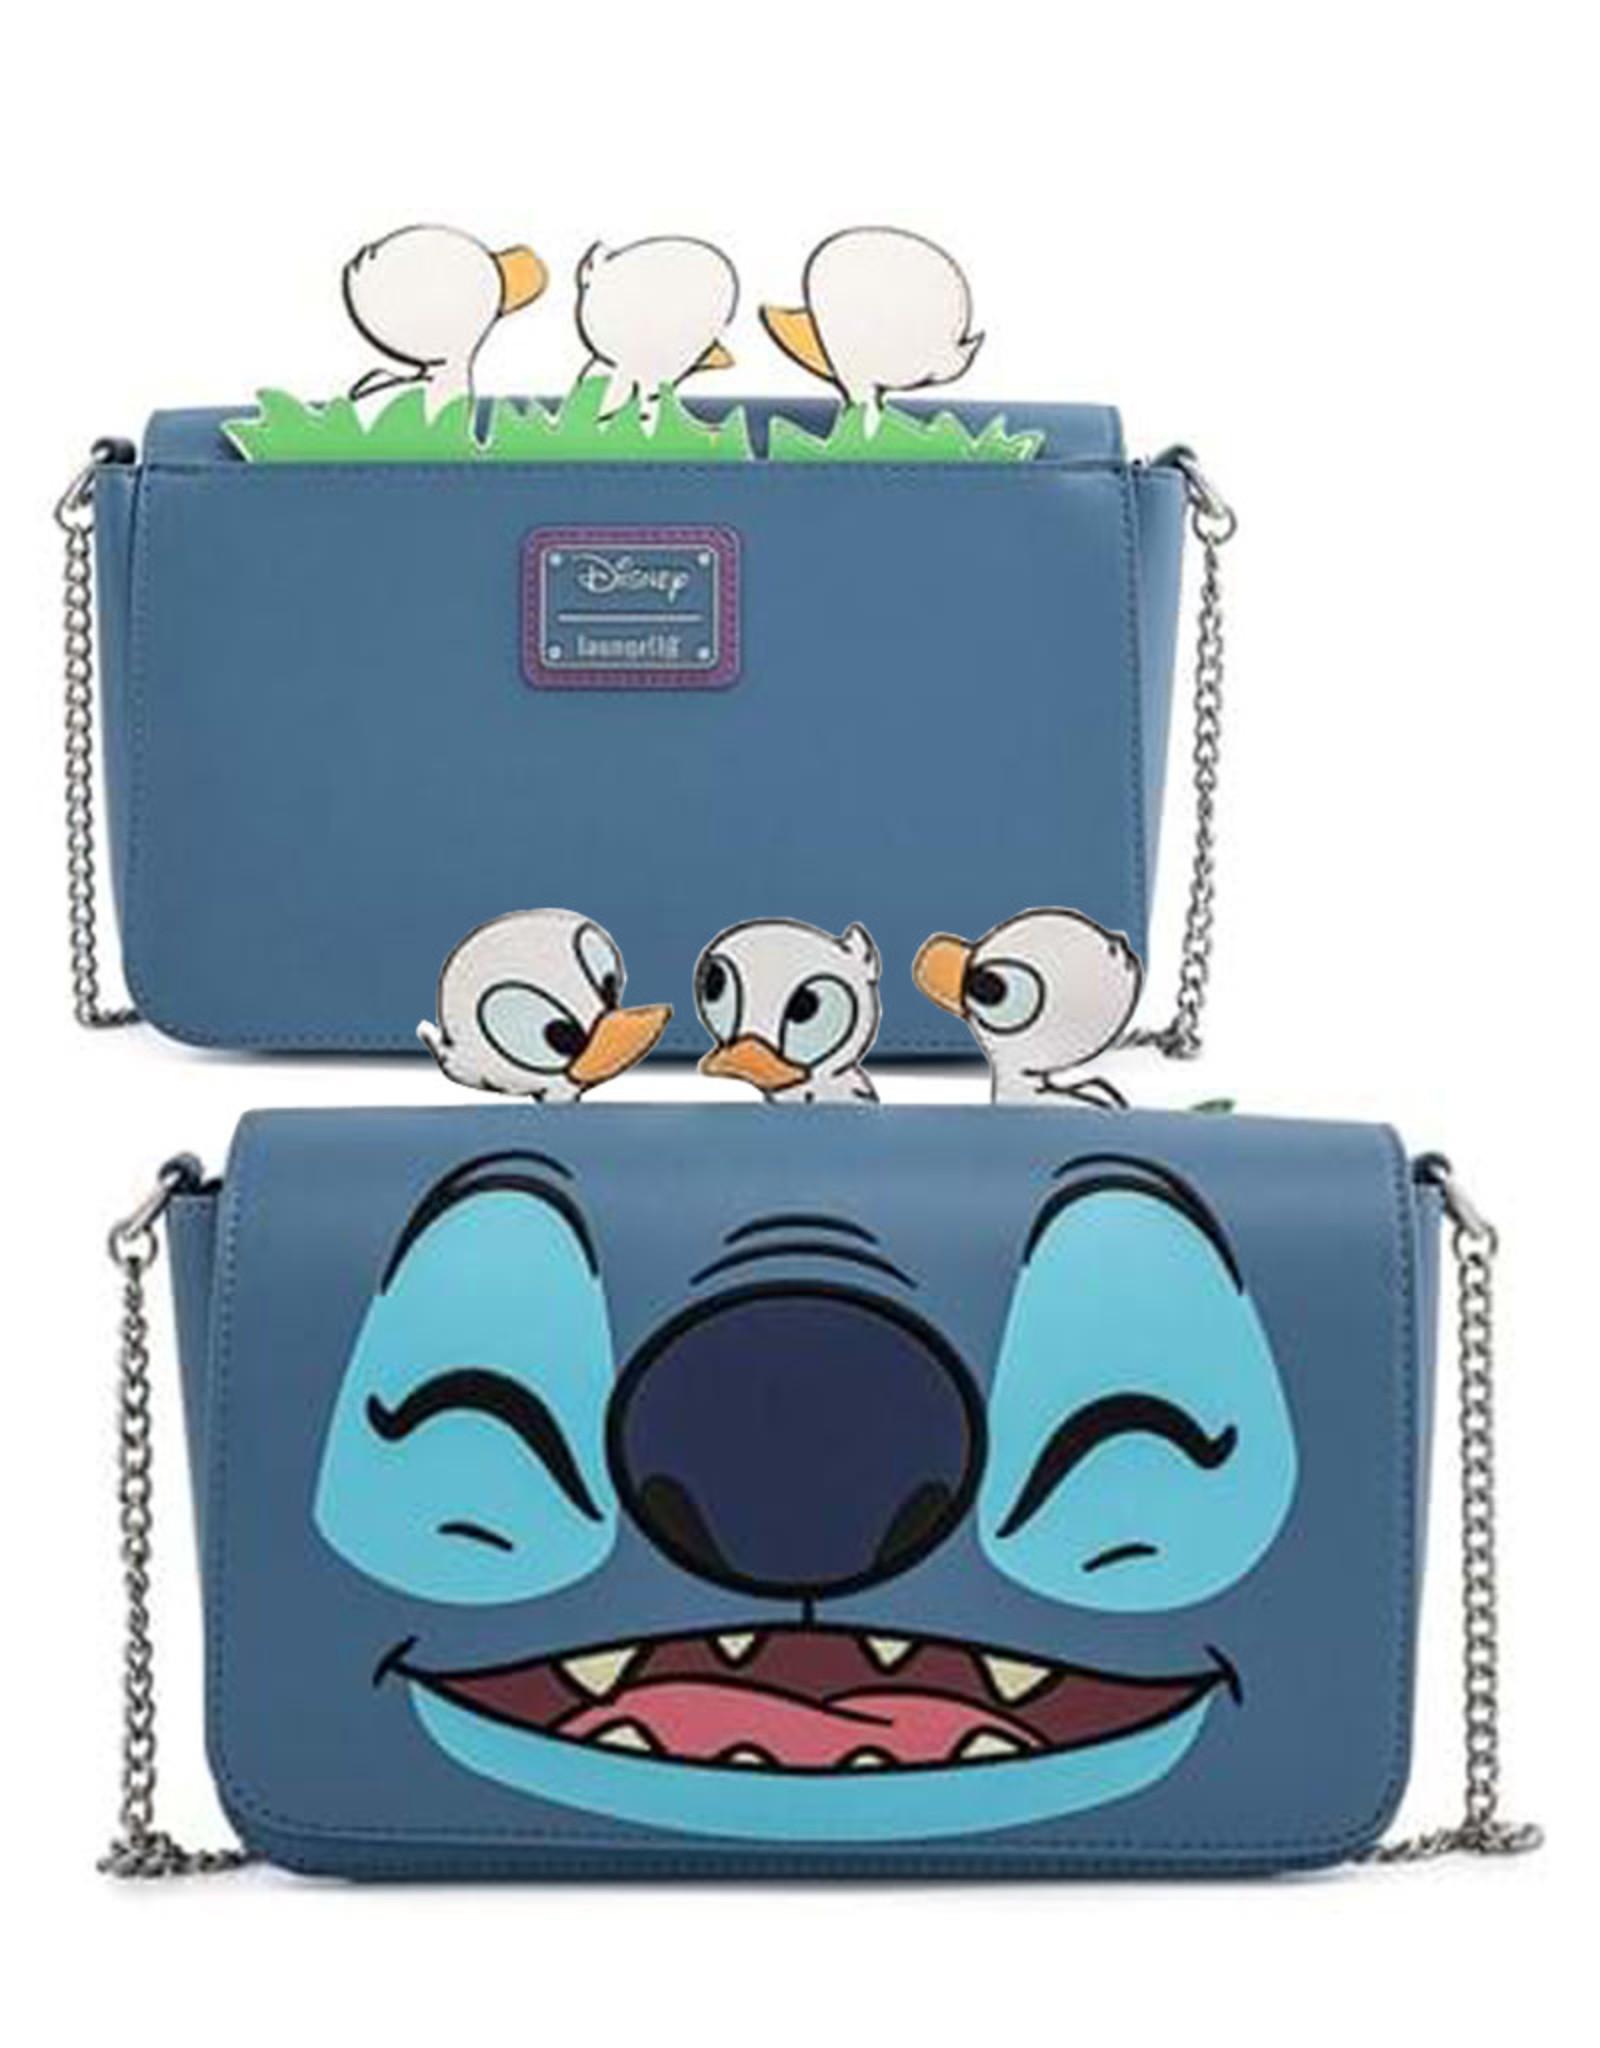 Disney ( Loungefly Handbag ) Stitch with Ducks